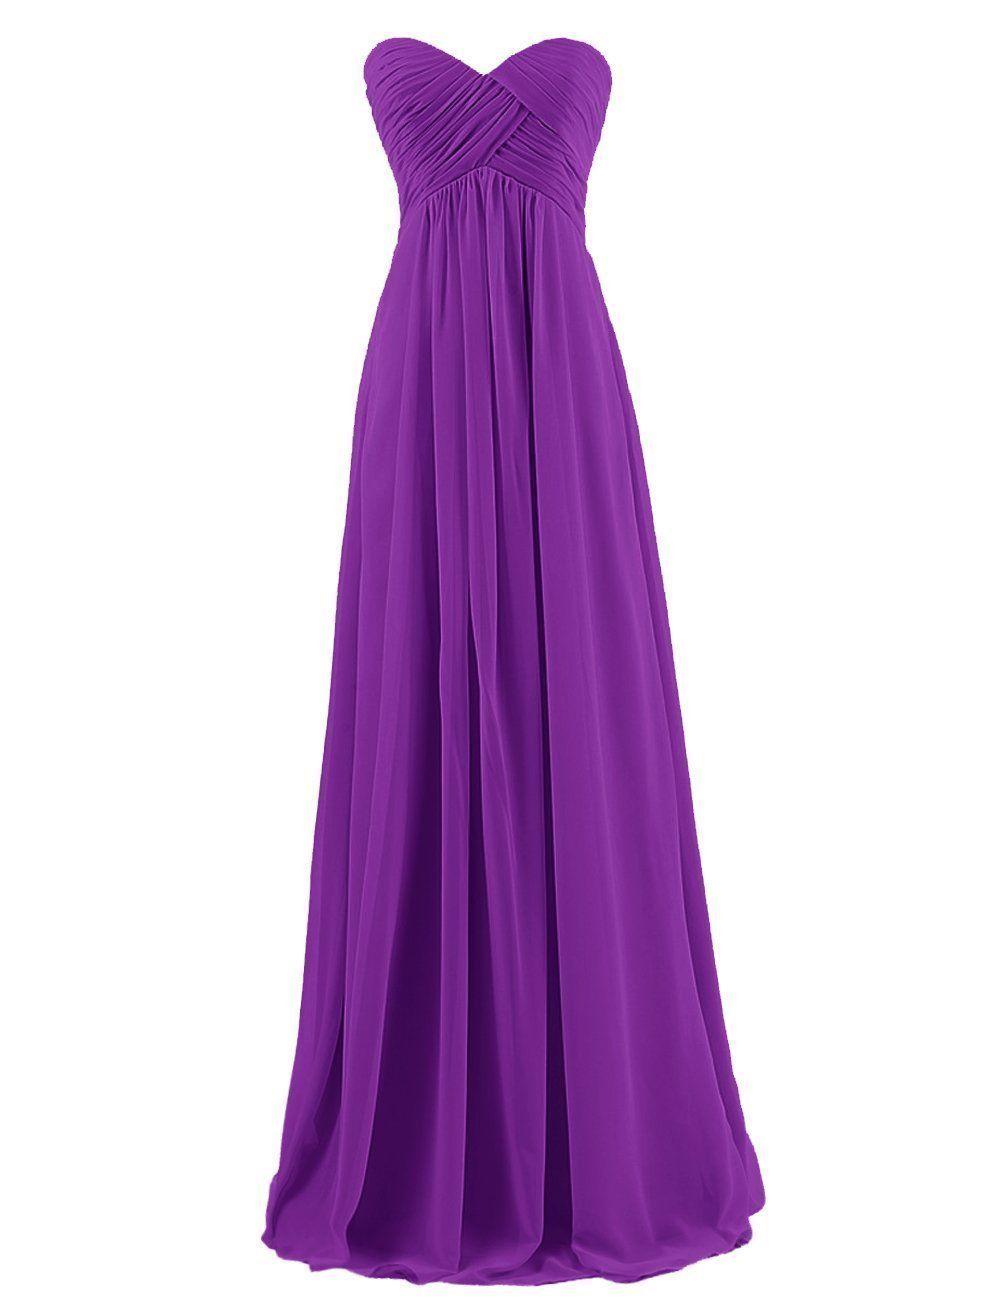 Modec womens sweetheart chiffon bridesmaid long prom dress purple